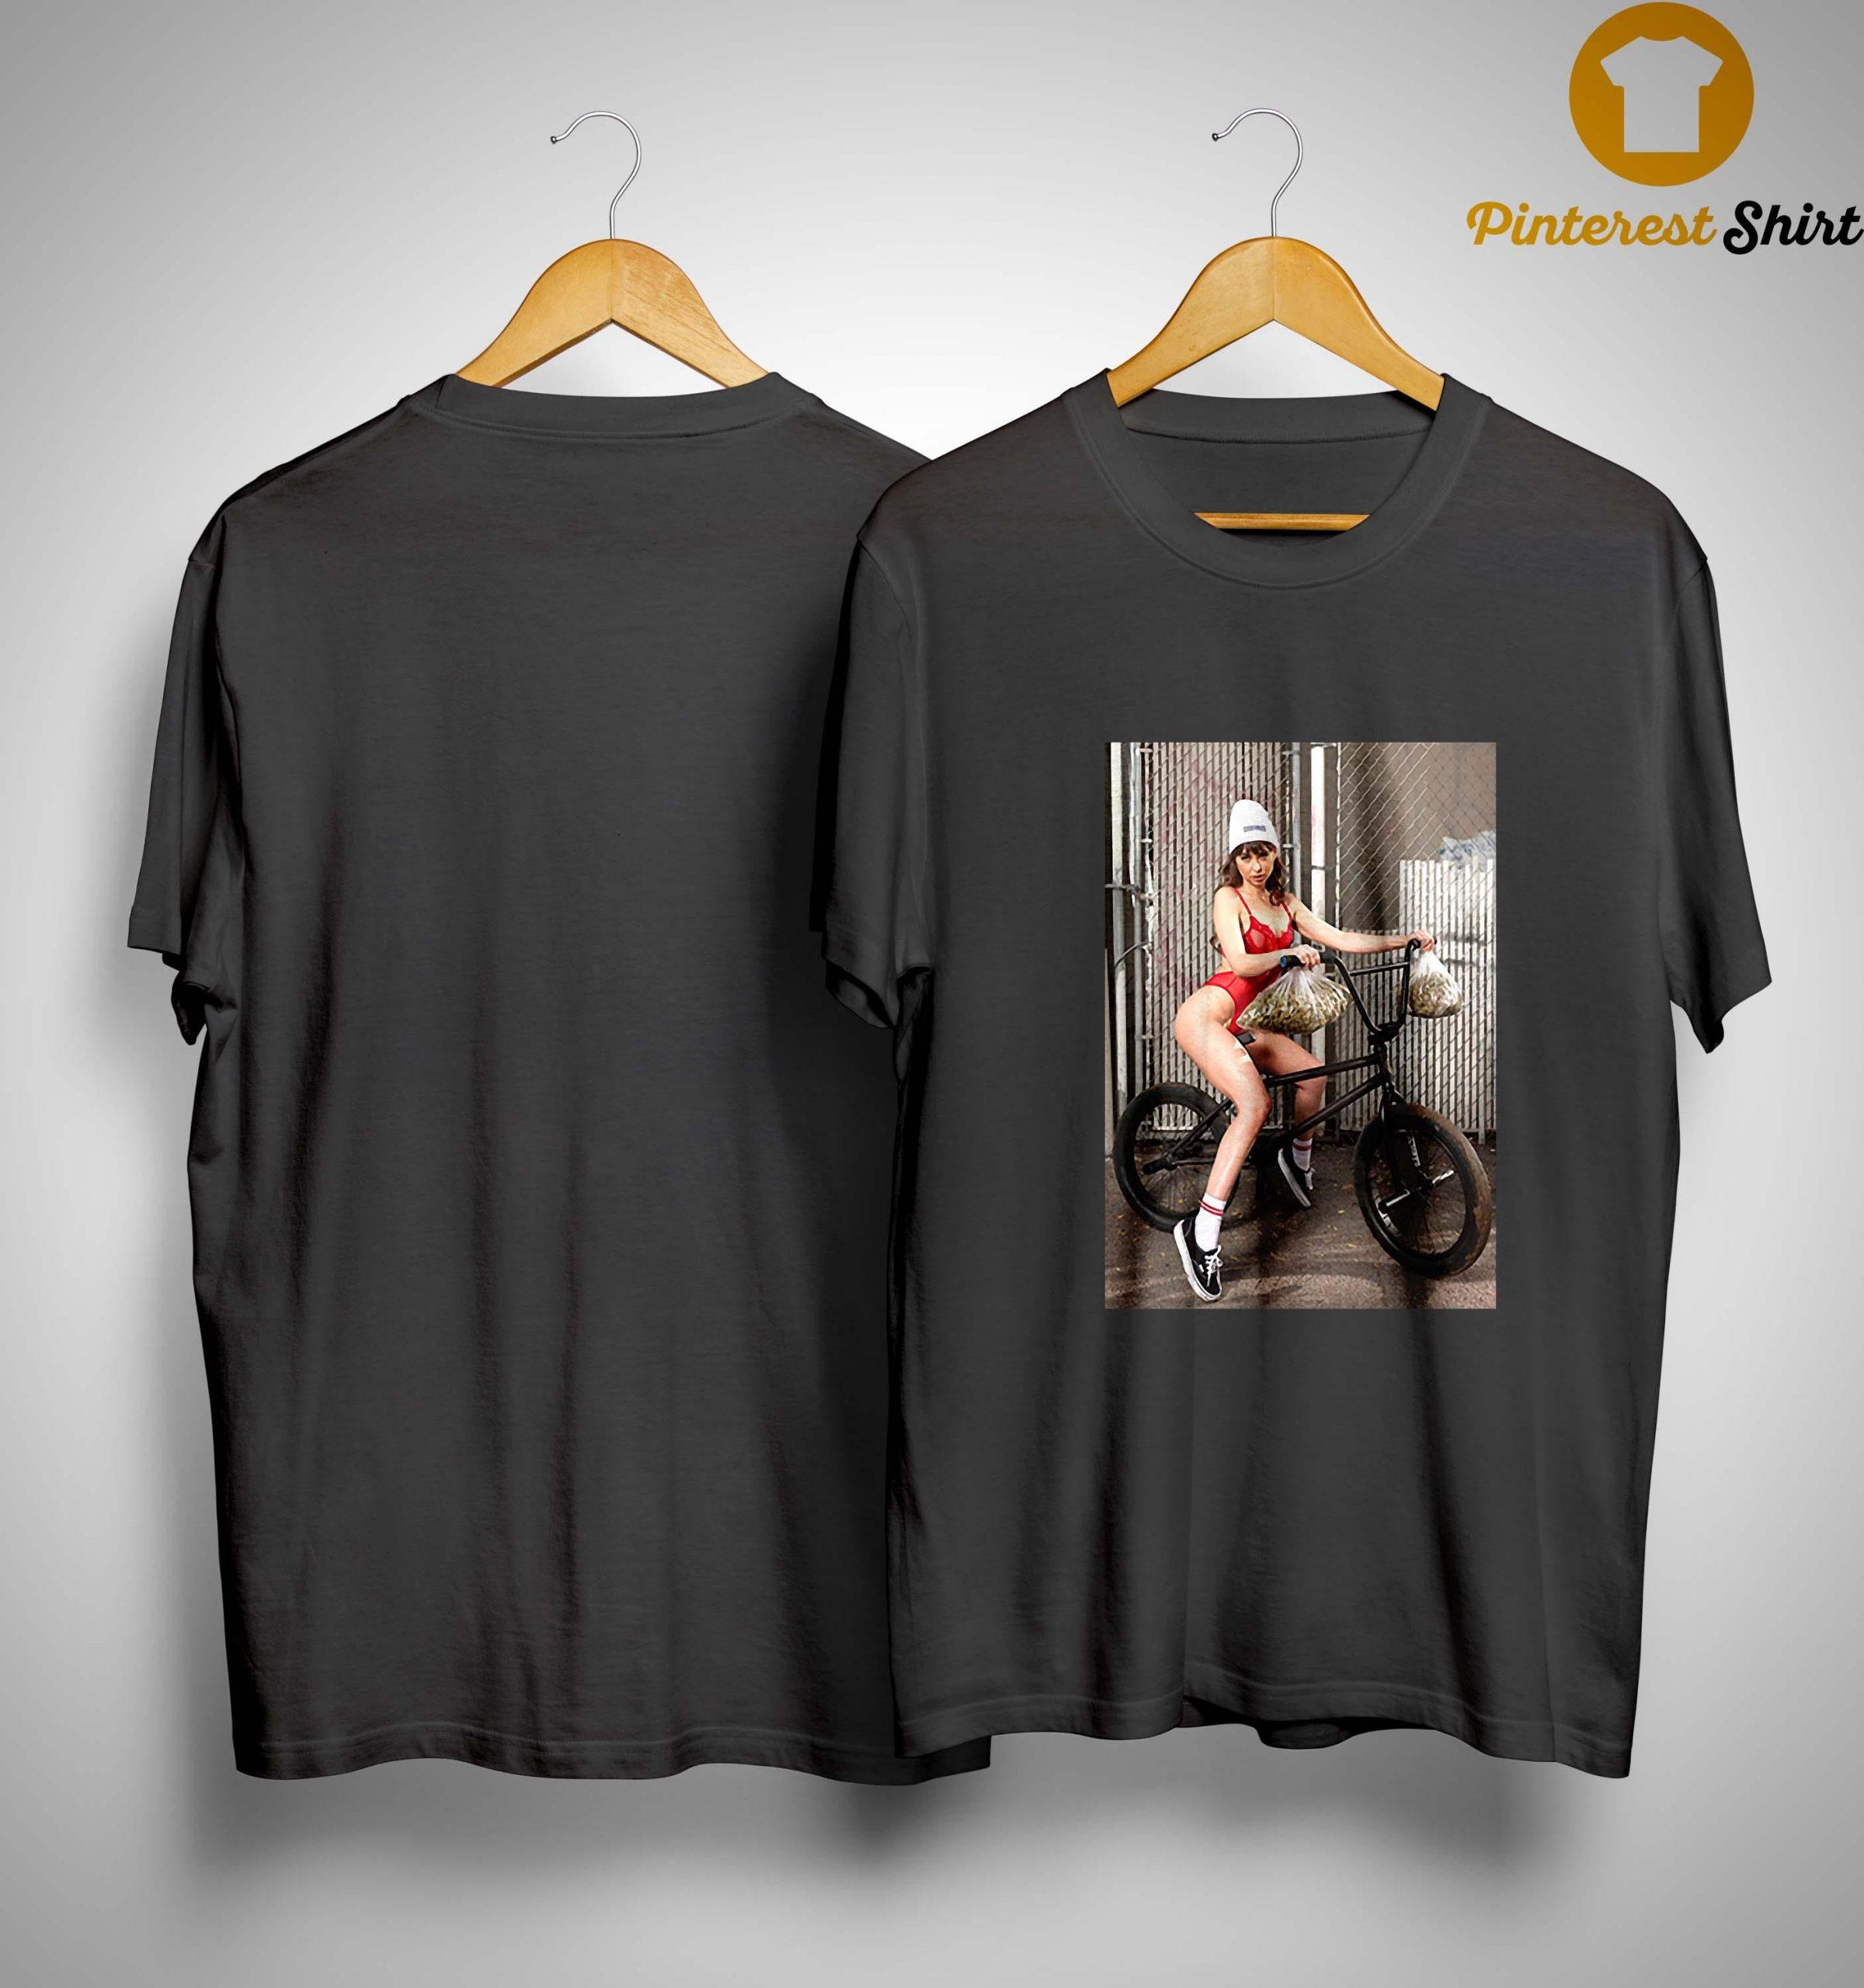 Riley Reid Shirt